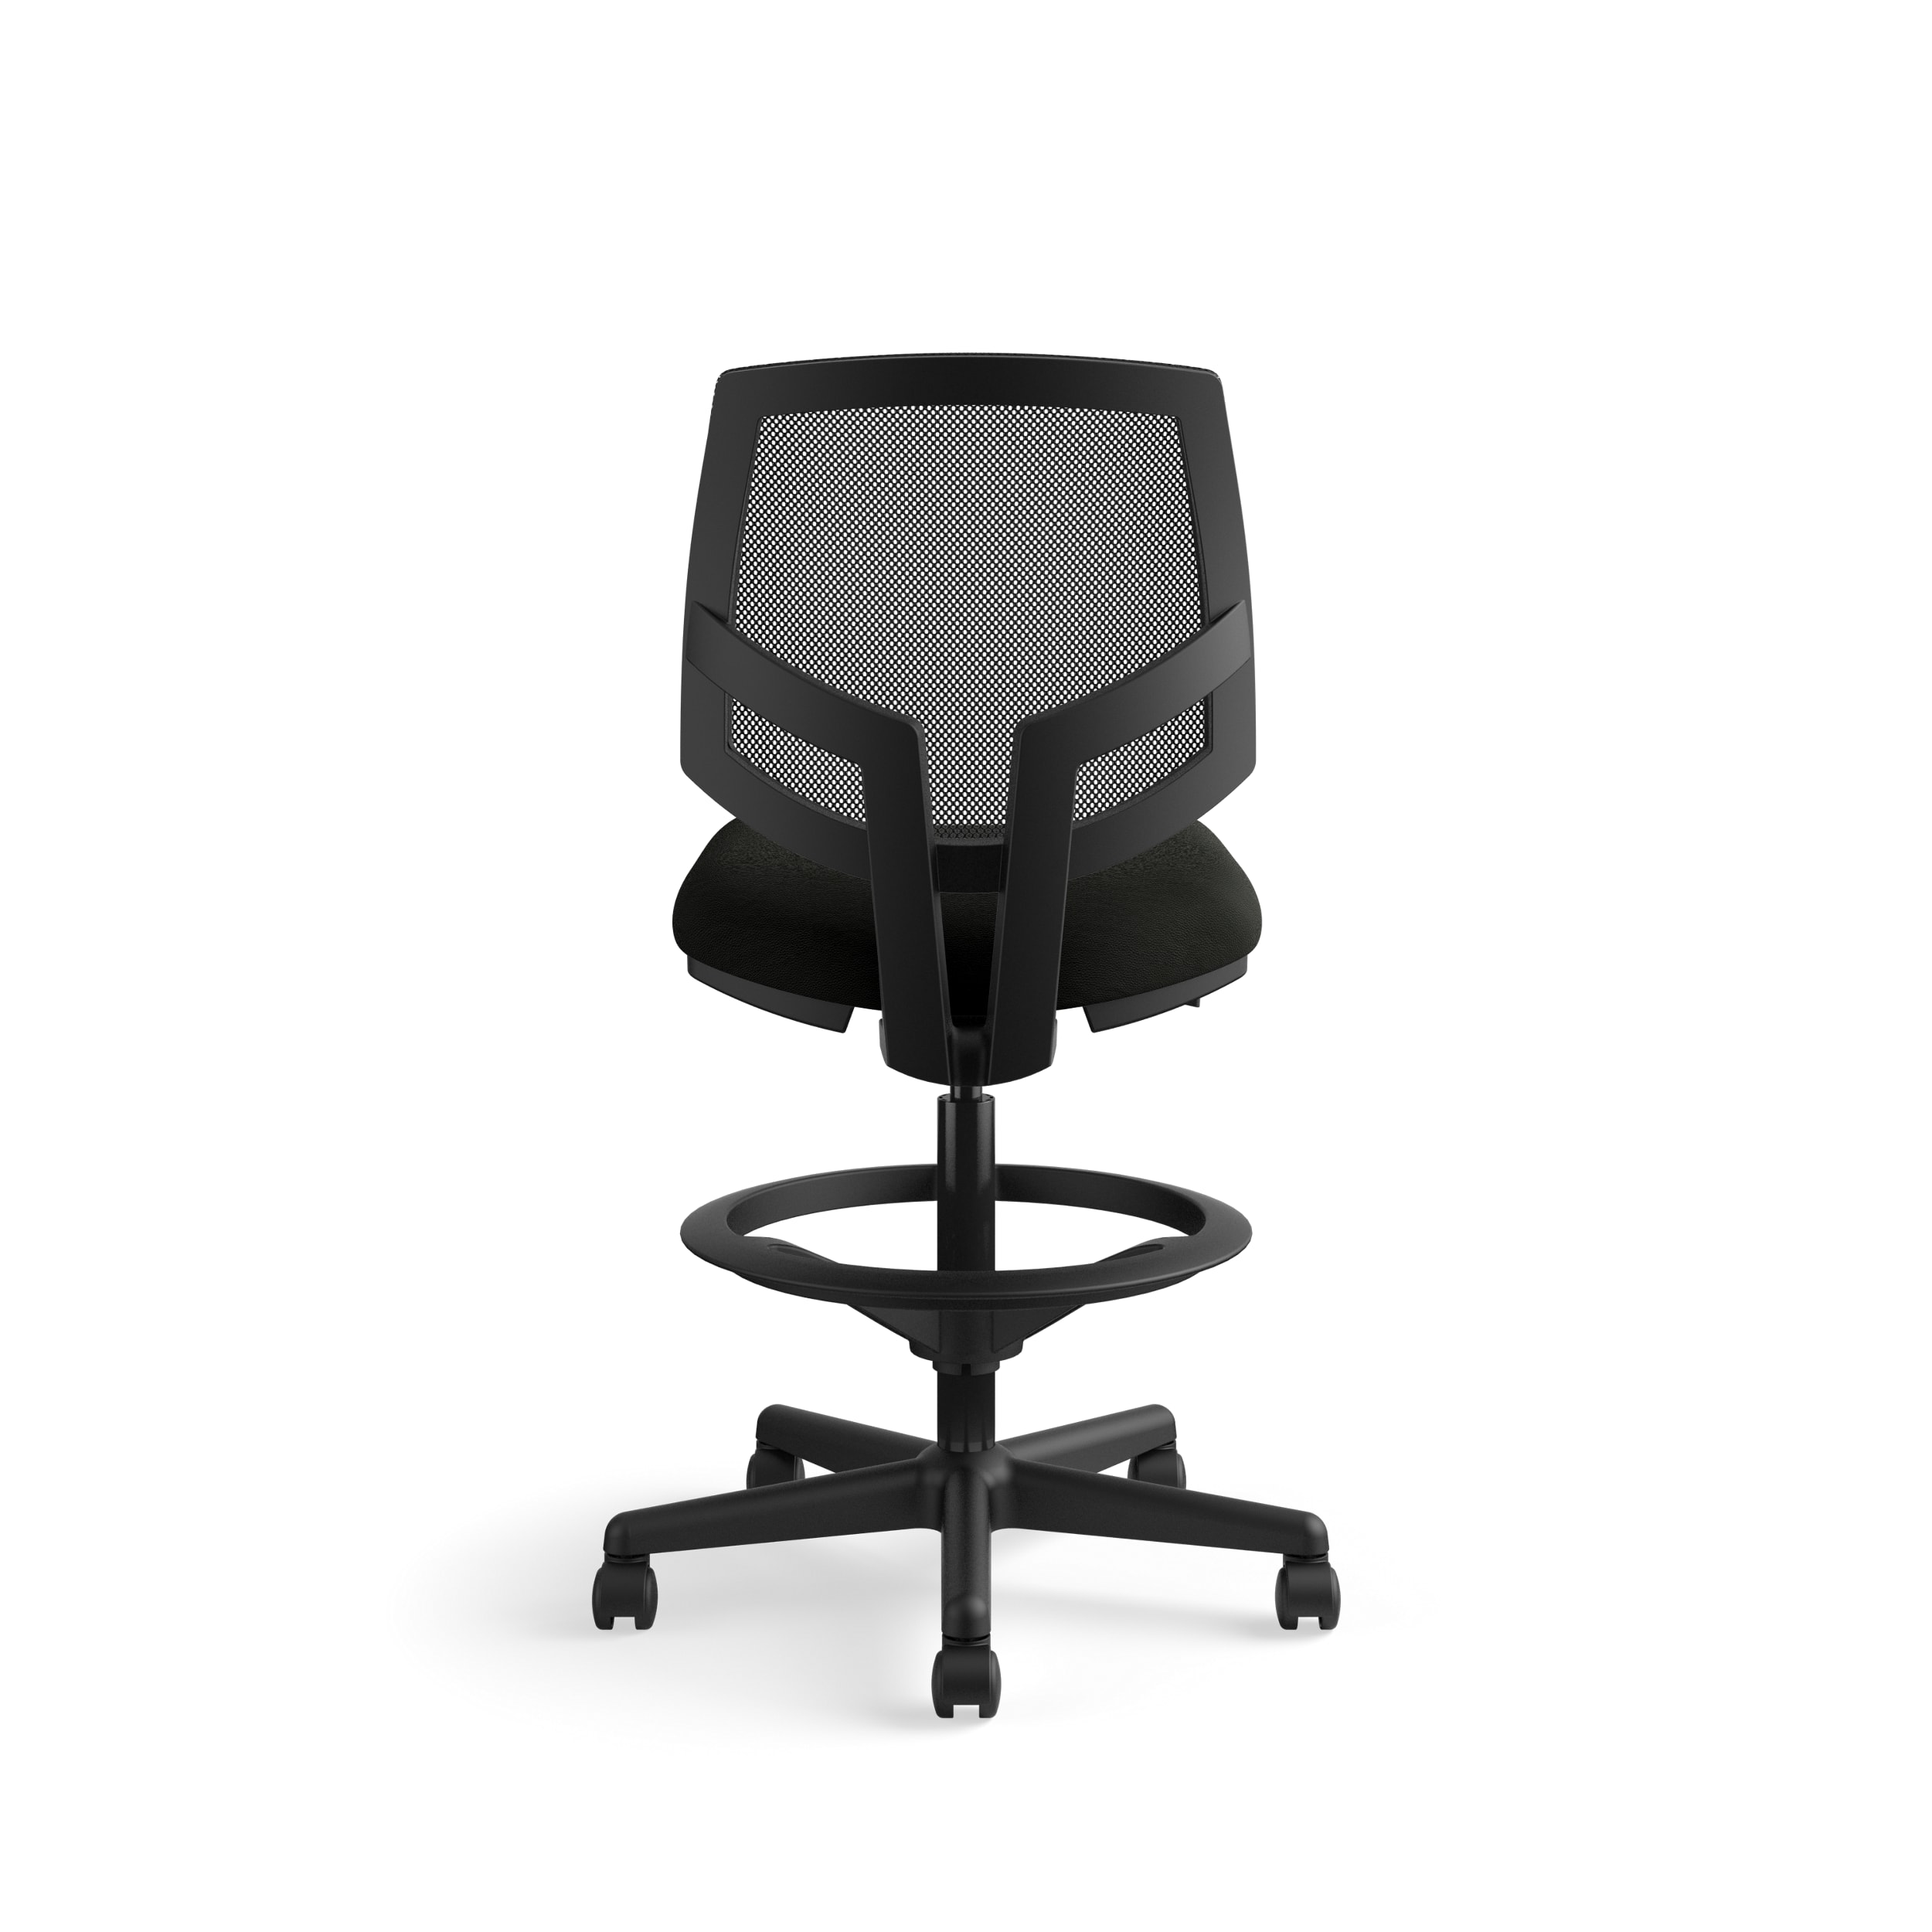 Black H5715 The HON Company SB11.T HON5715SB11T HON Volt Mesh Back Task Upholstered Adjustable Office Stool